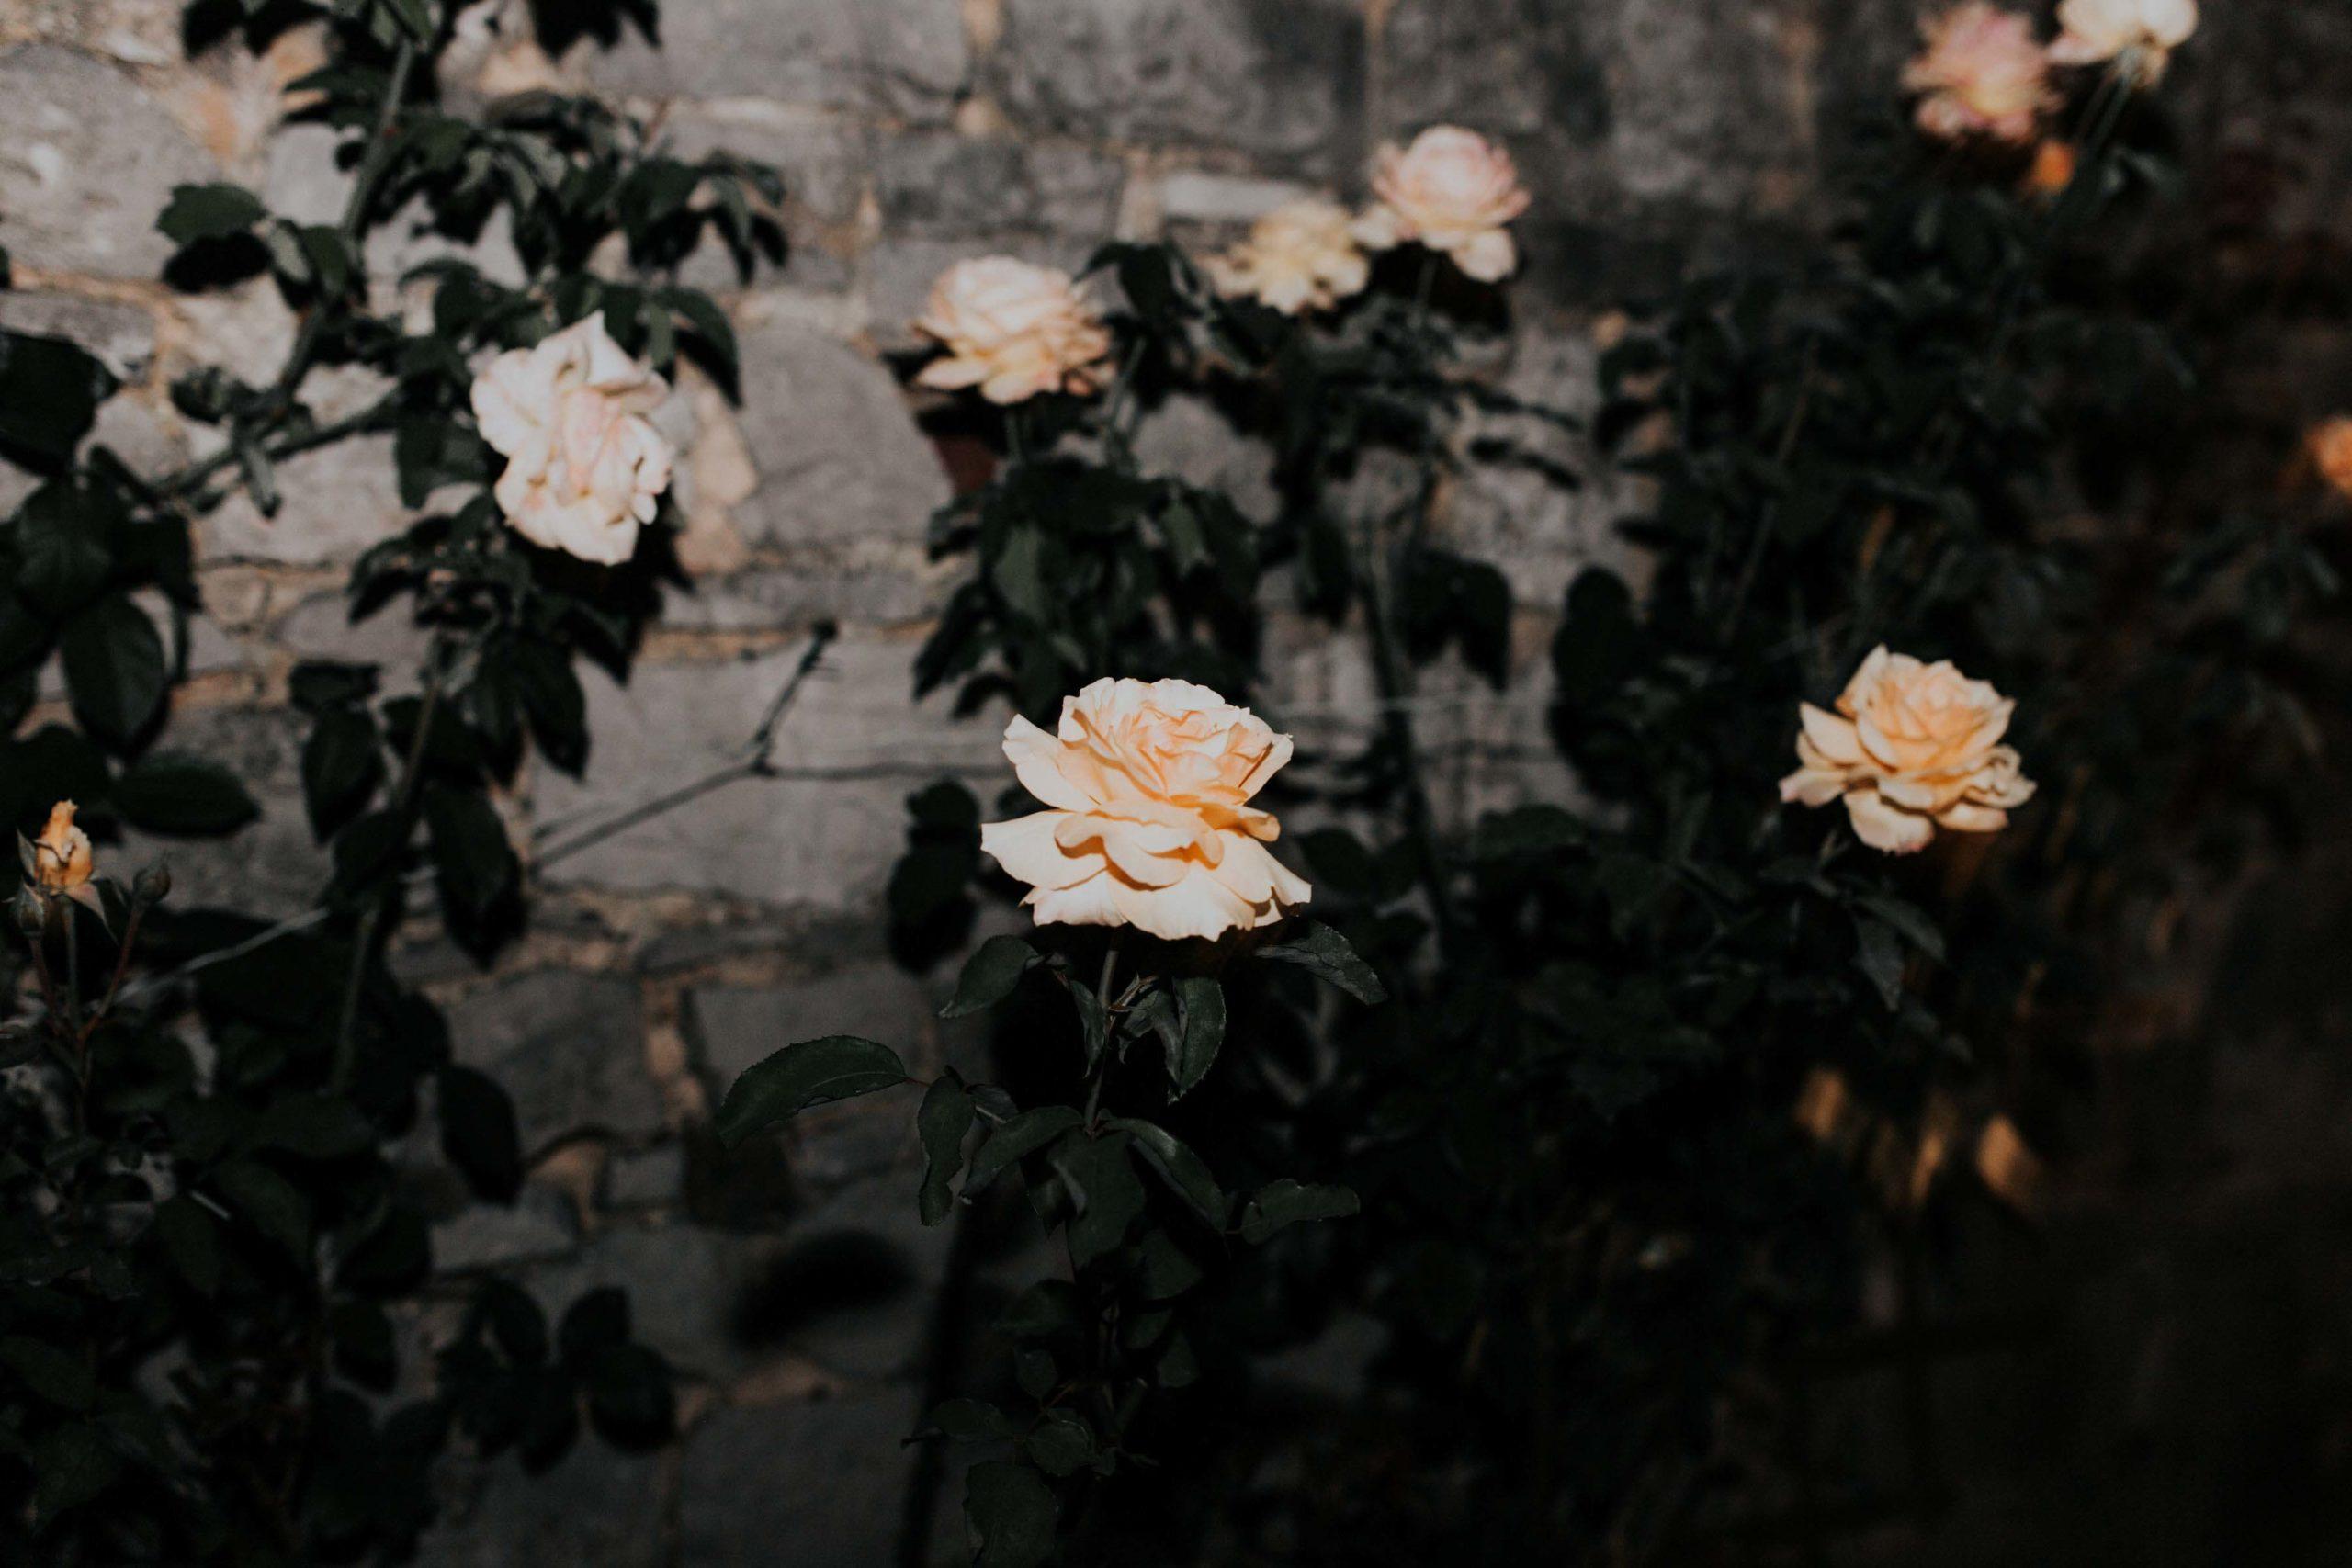 SFOREVER-MARIAGE-PHOTOGRAPHE-BELGIQUE-678-1-scaled-1